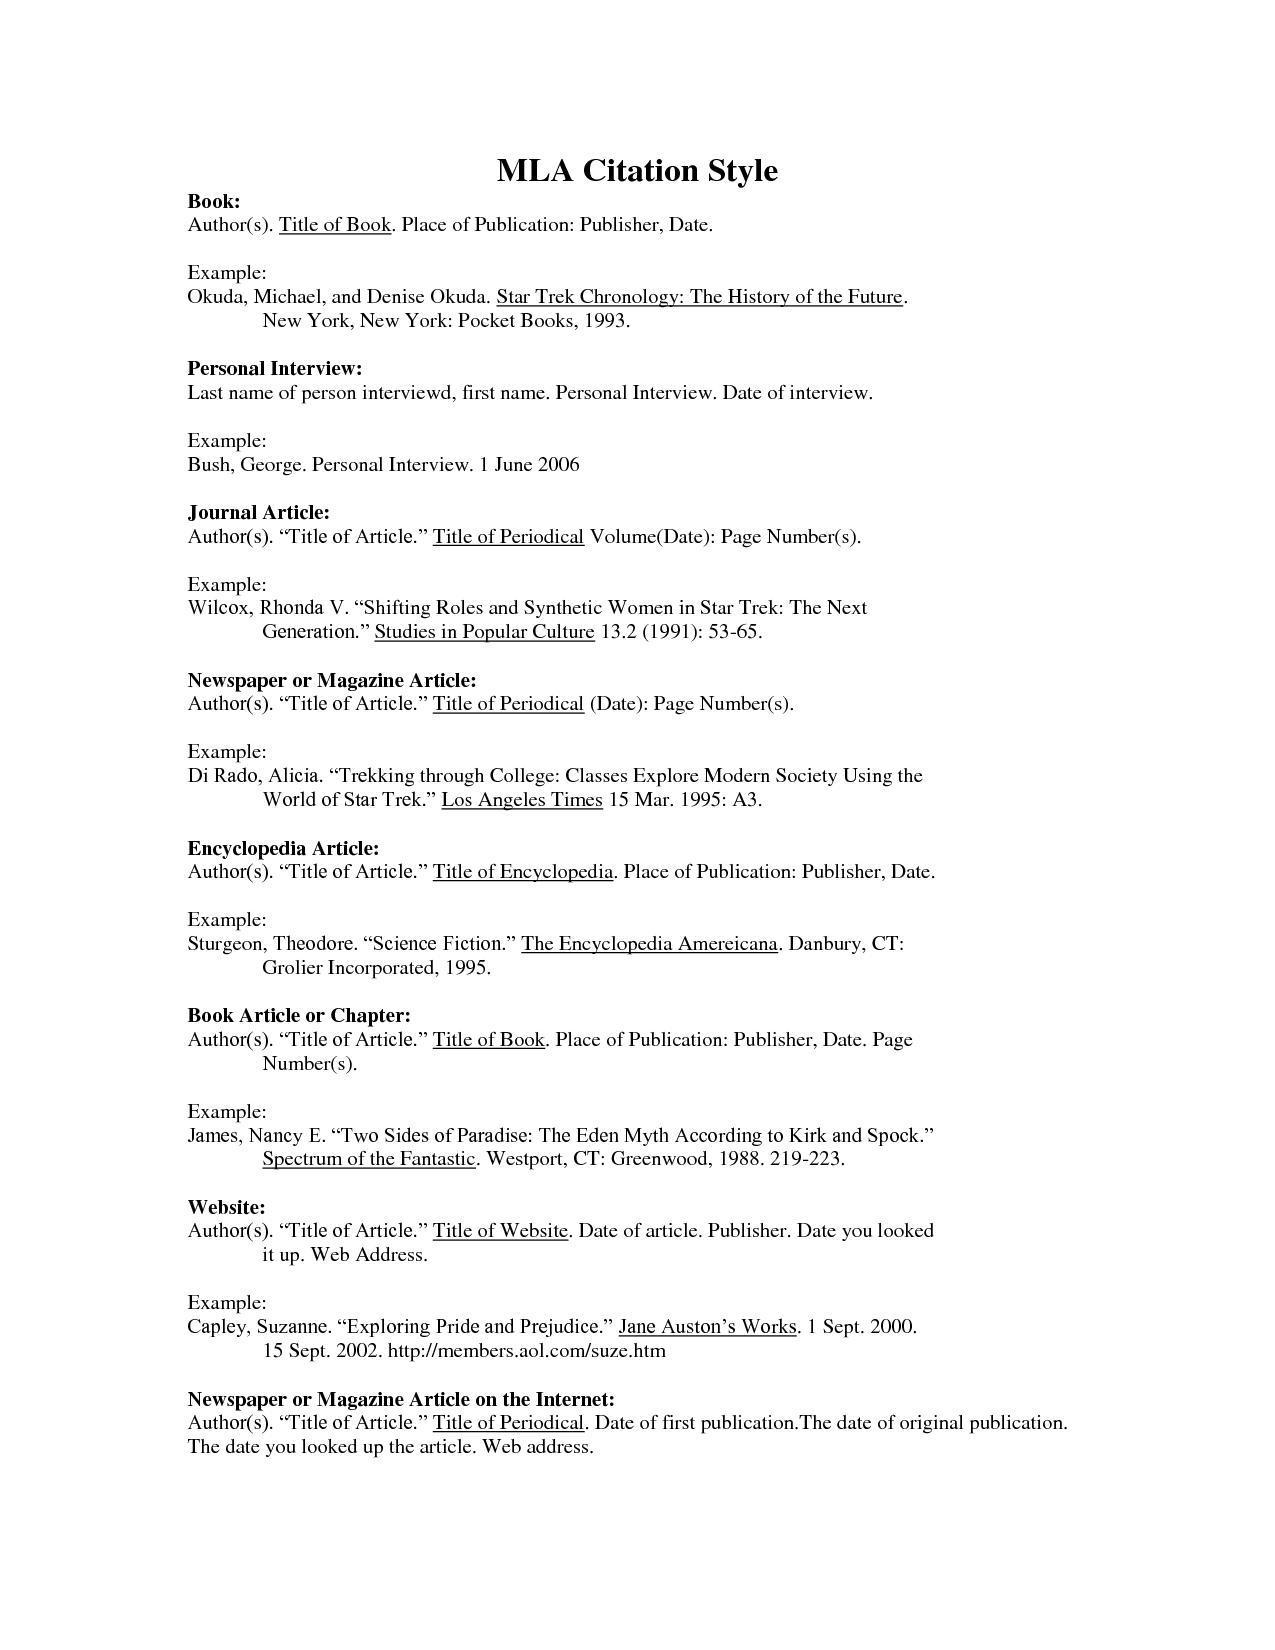 Annotated Bibliography Mla The Mla Handbook Addresses Annotated